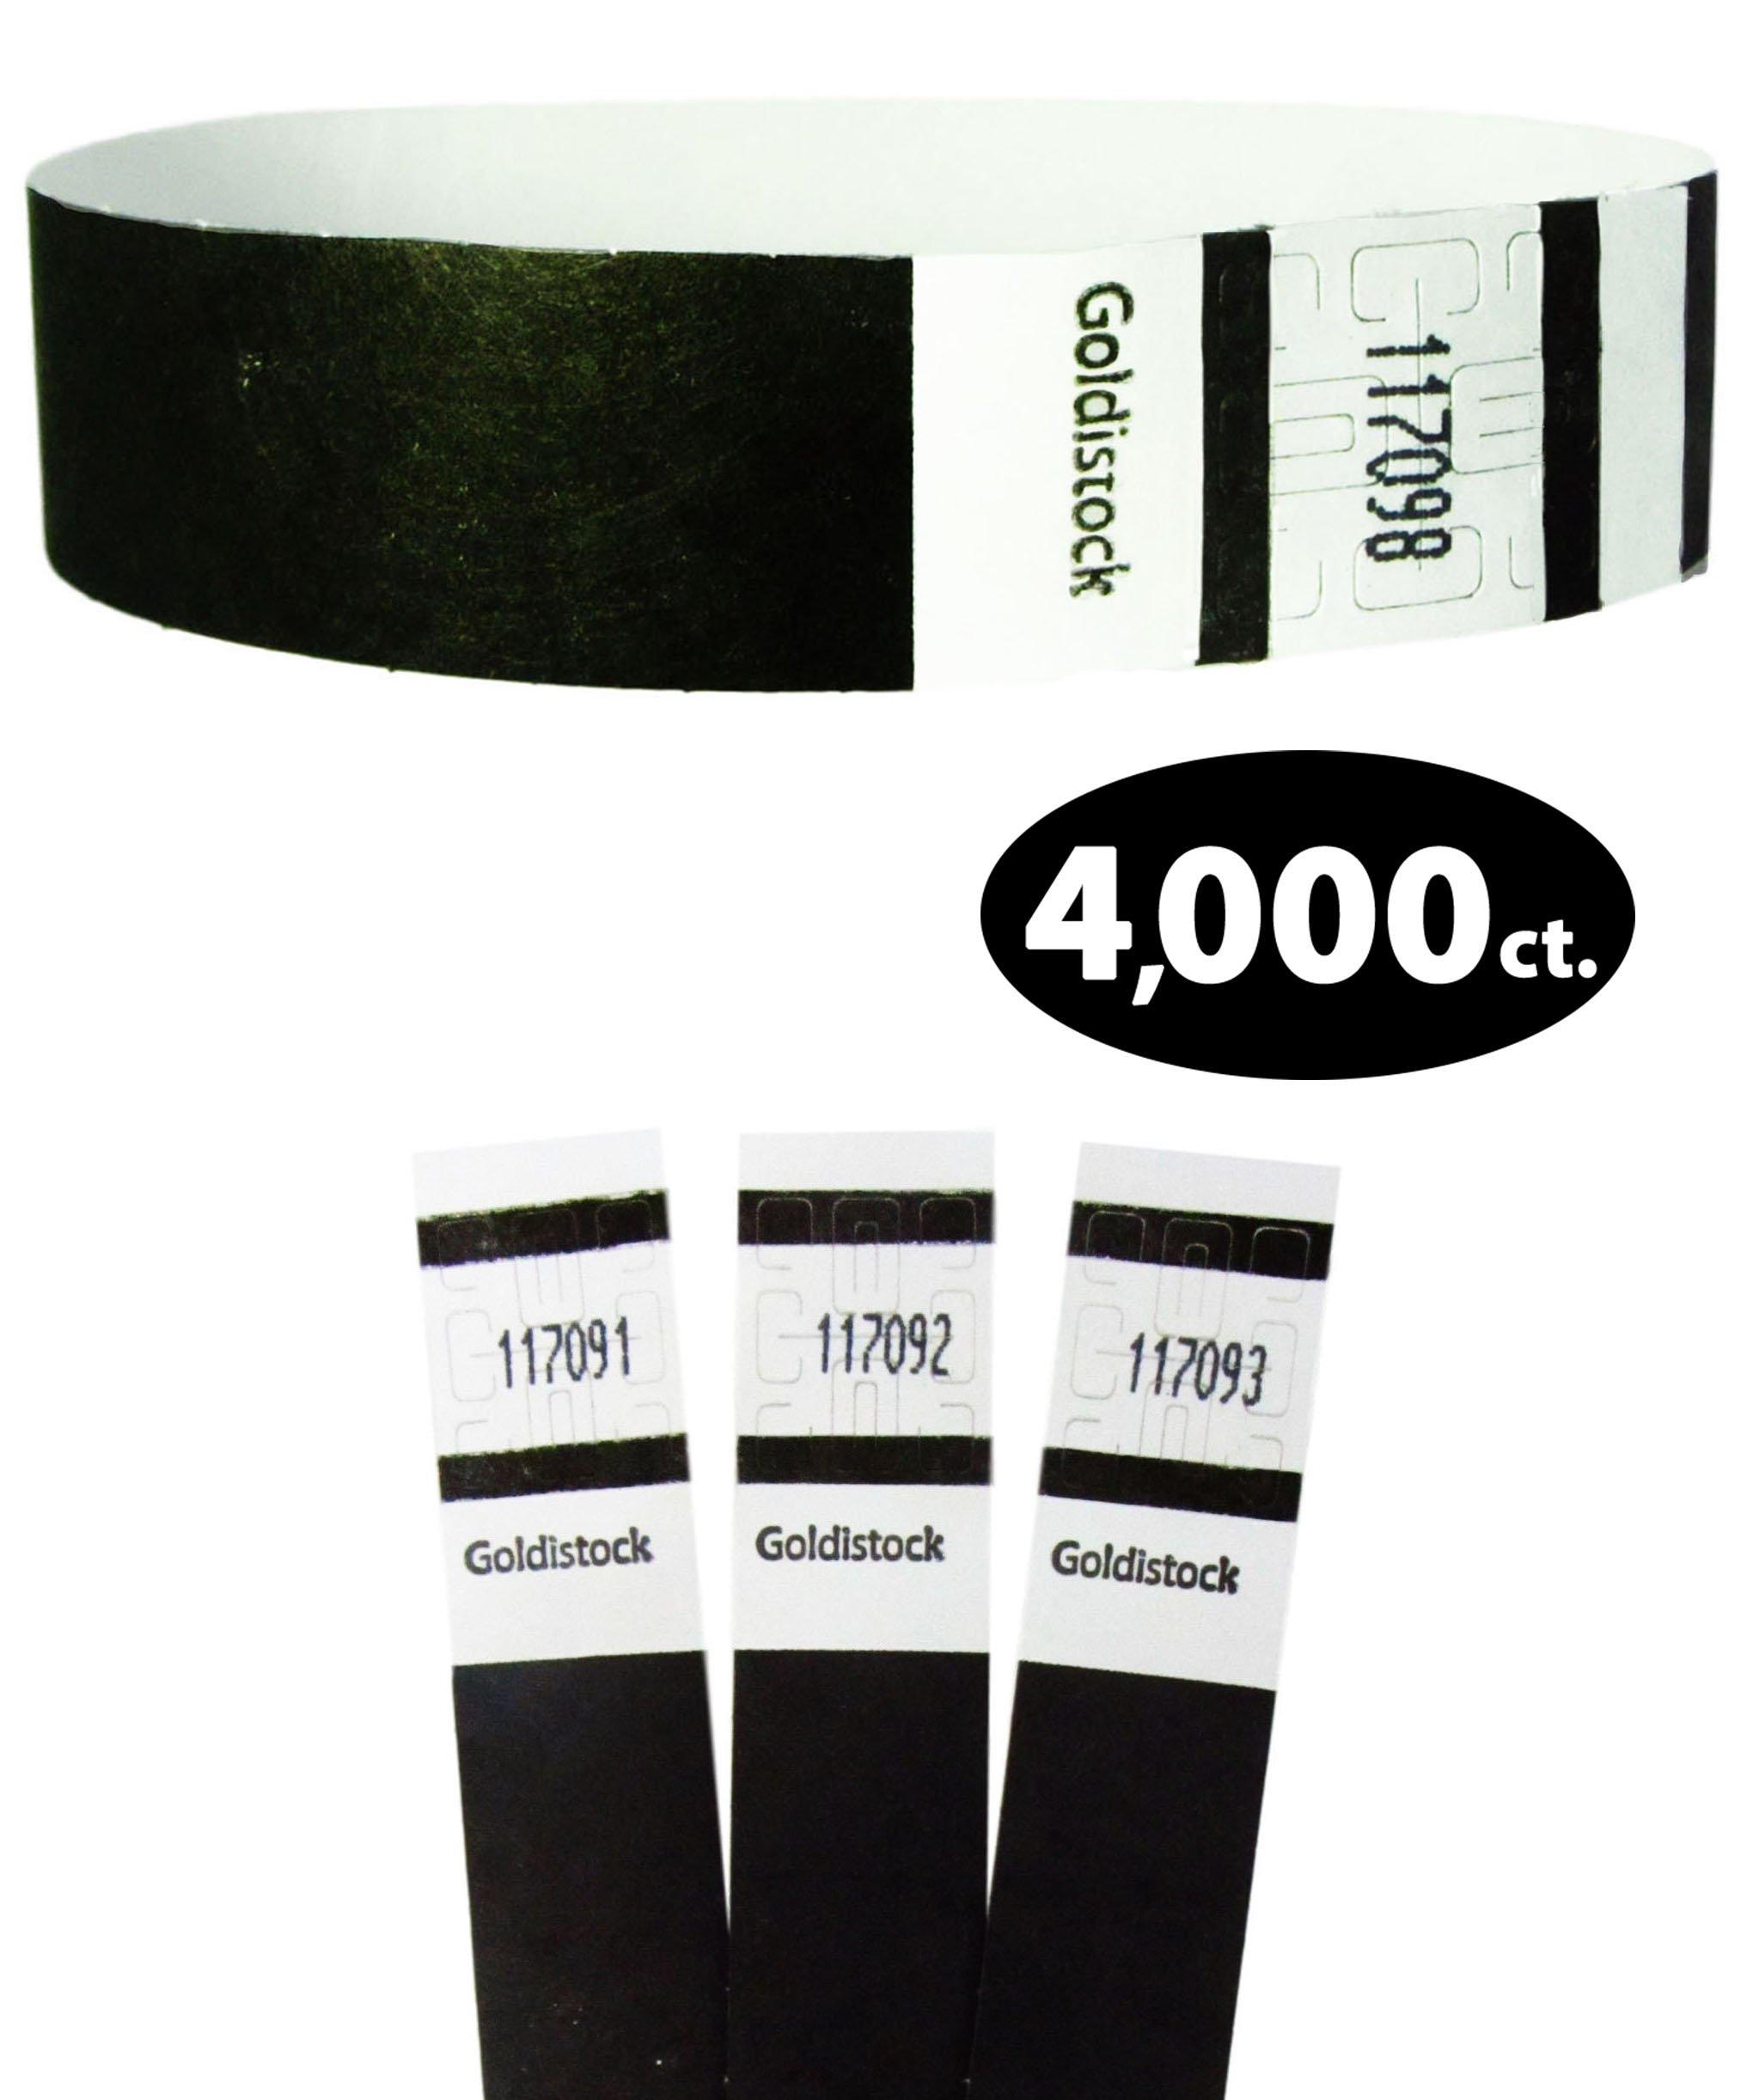 Goldistock Original Series - 3/4'' Tyvek Wristbands Tuxedo Black 4,000 Count Value Pack - Event Identification Bands (Paper - Like Texture)